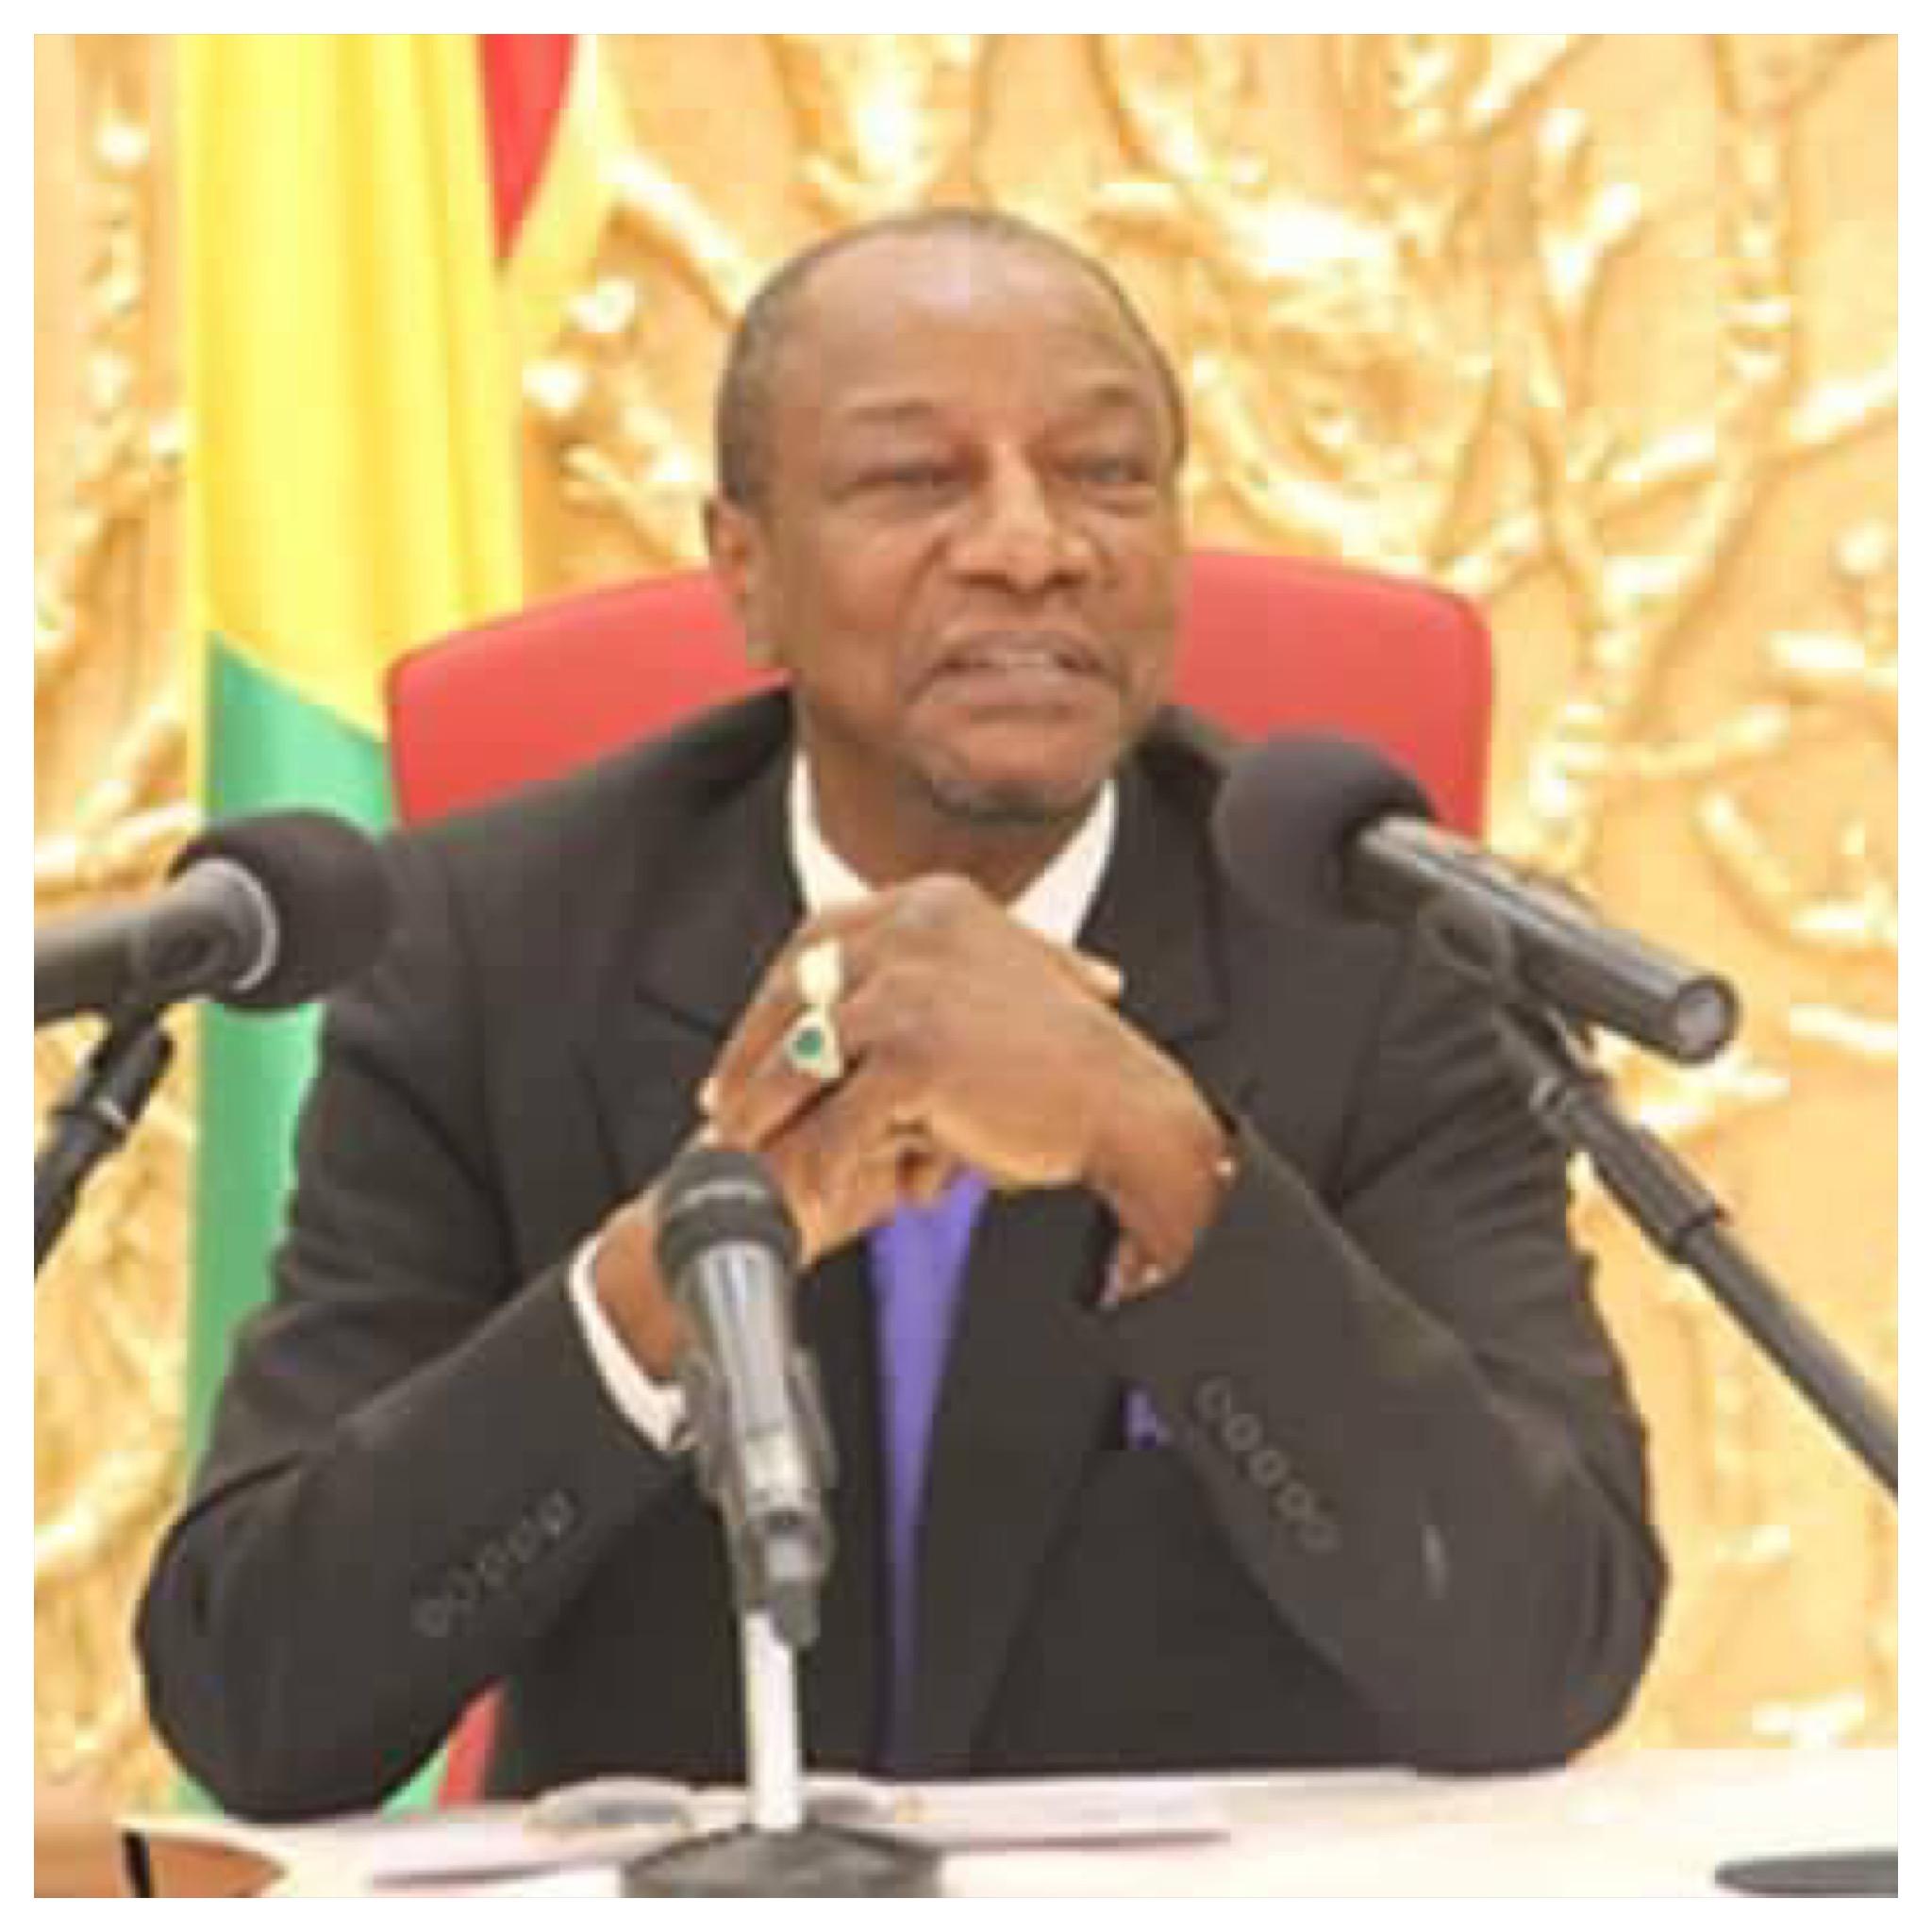 Alpha Conde President de Guinér conakry